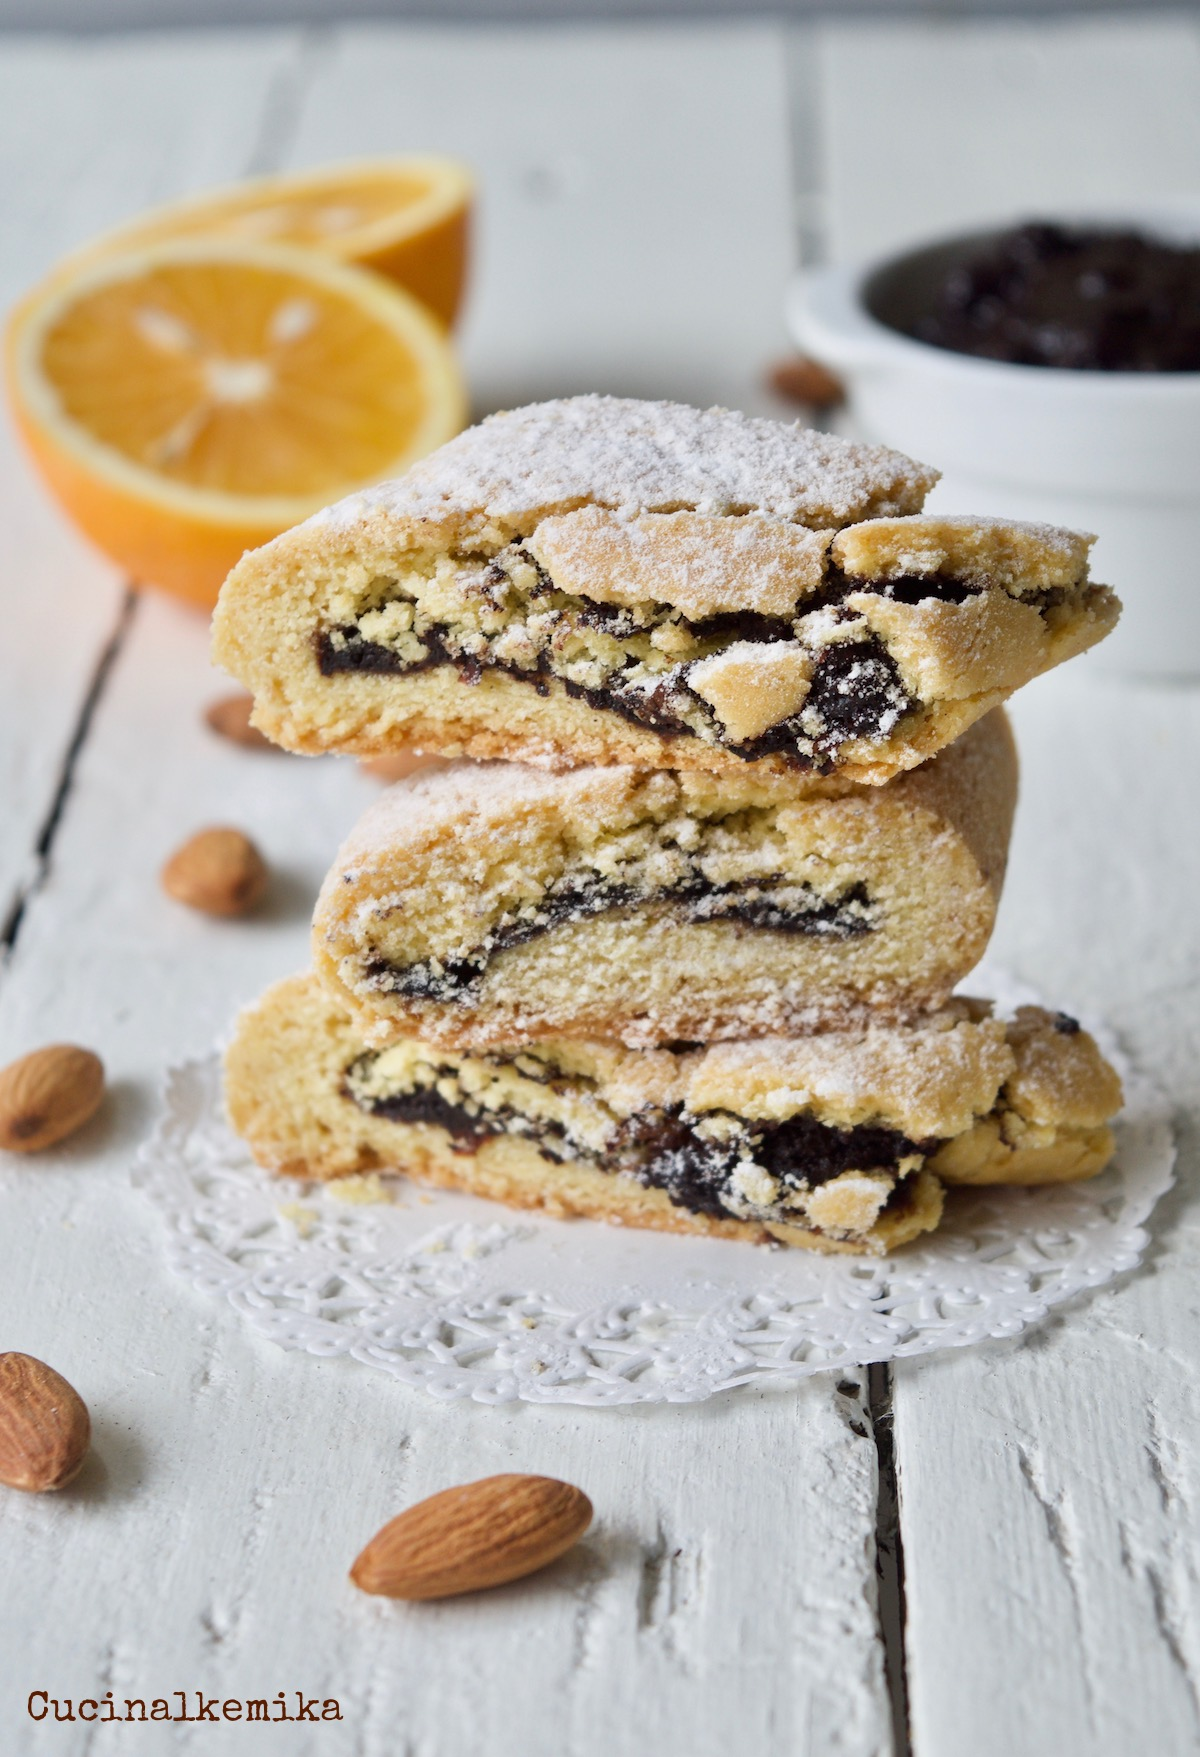 Cucinalkemika_biscotti Marmellata Uva Nera